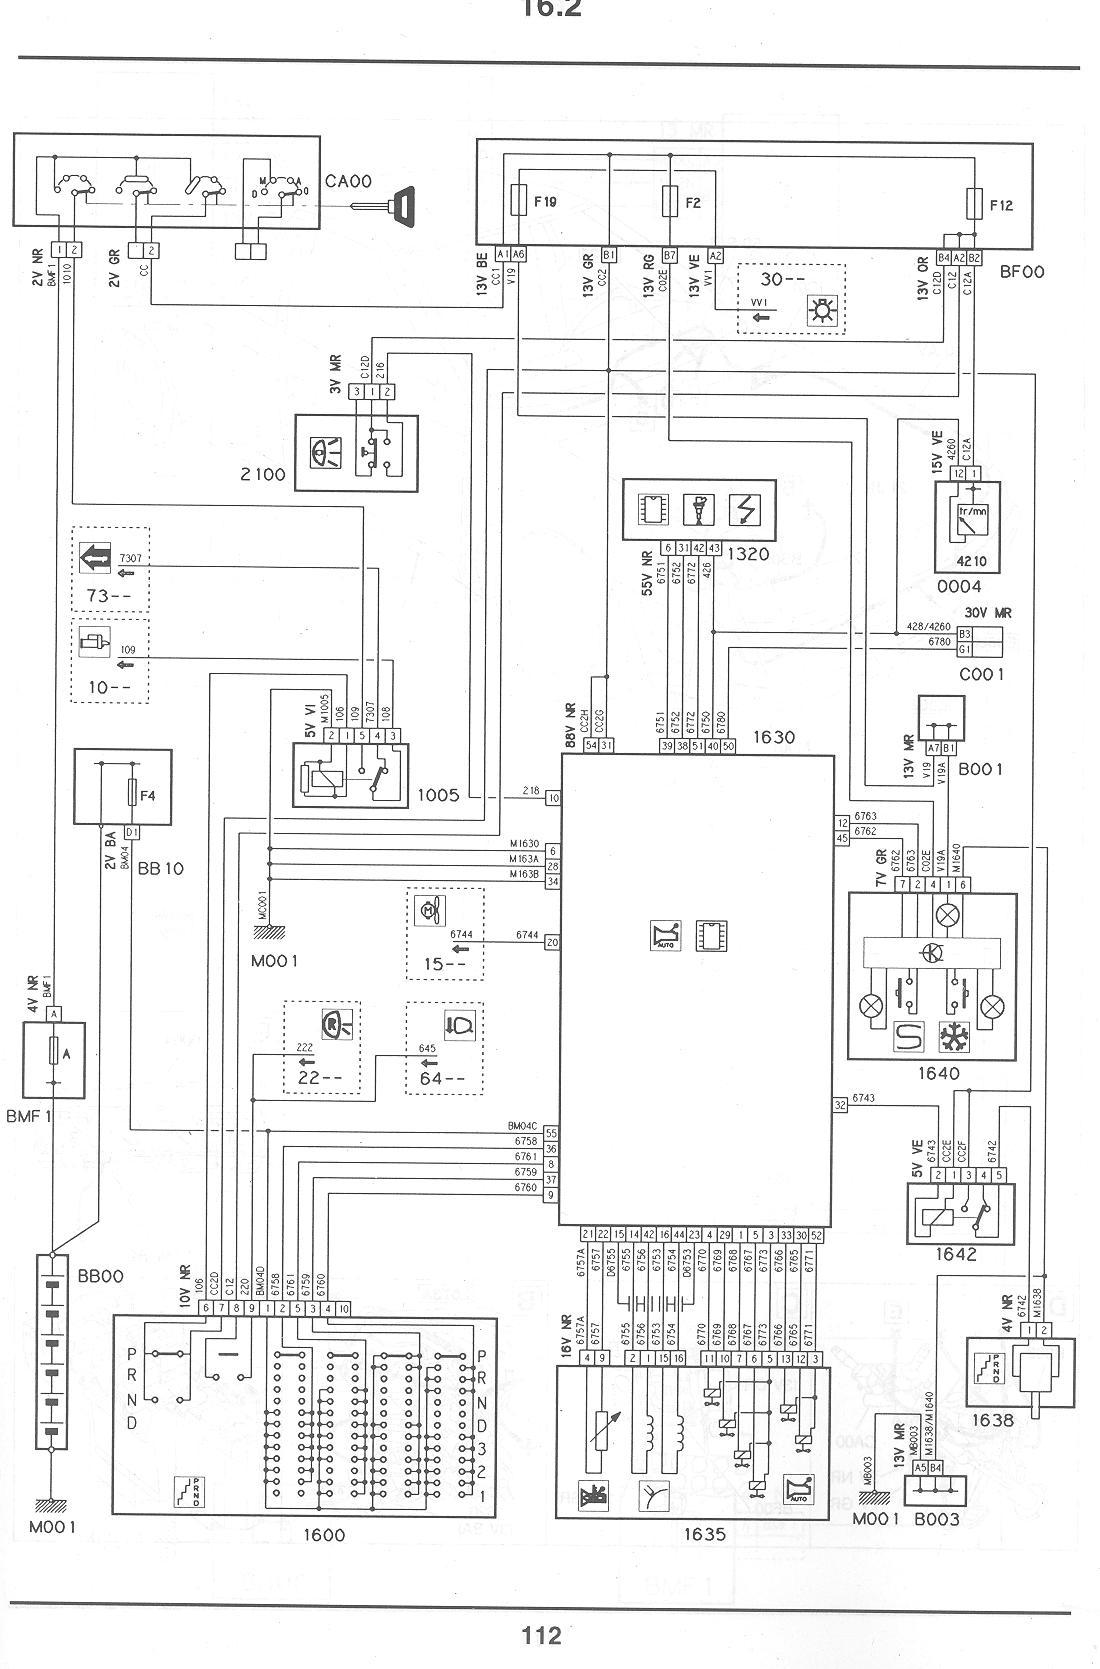 citroen berlingo van wiring diagram 2002 ford ranger parts c3 free download imageresizertool com